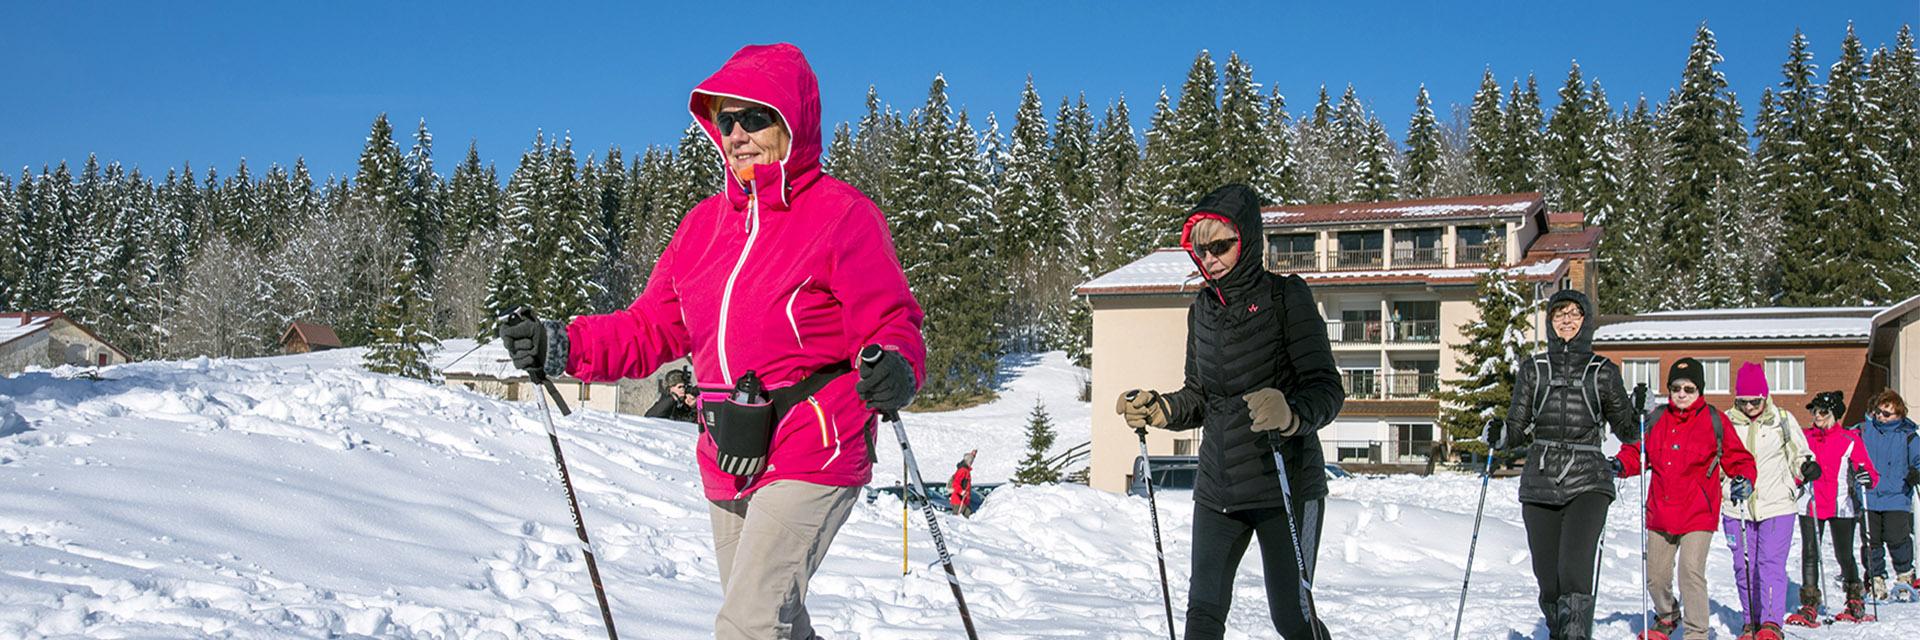 Village_club_vacances_jure-neige-et-plein-air-rando